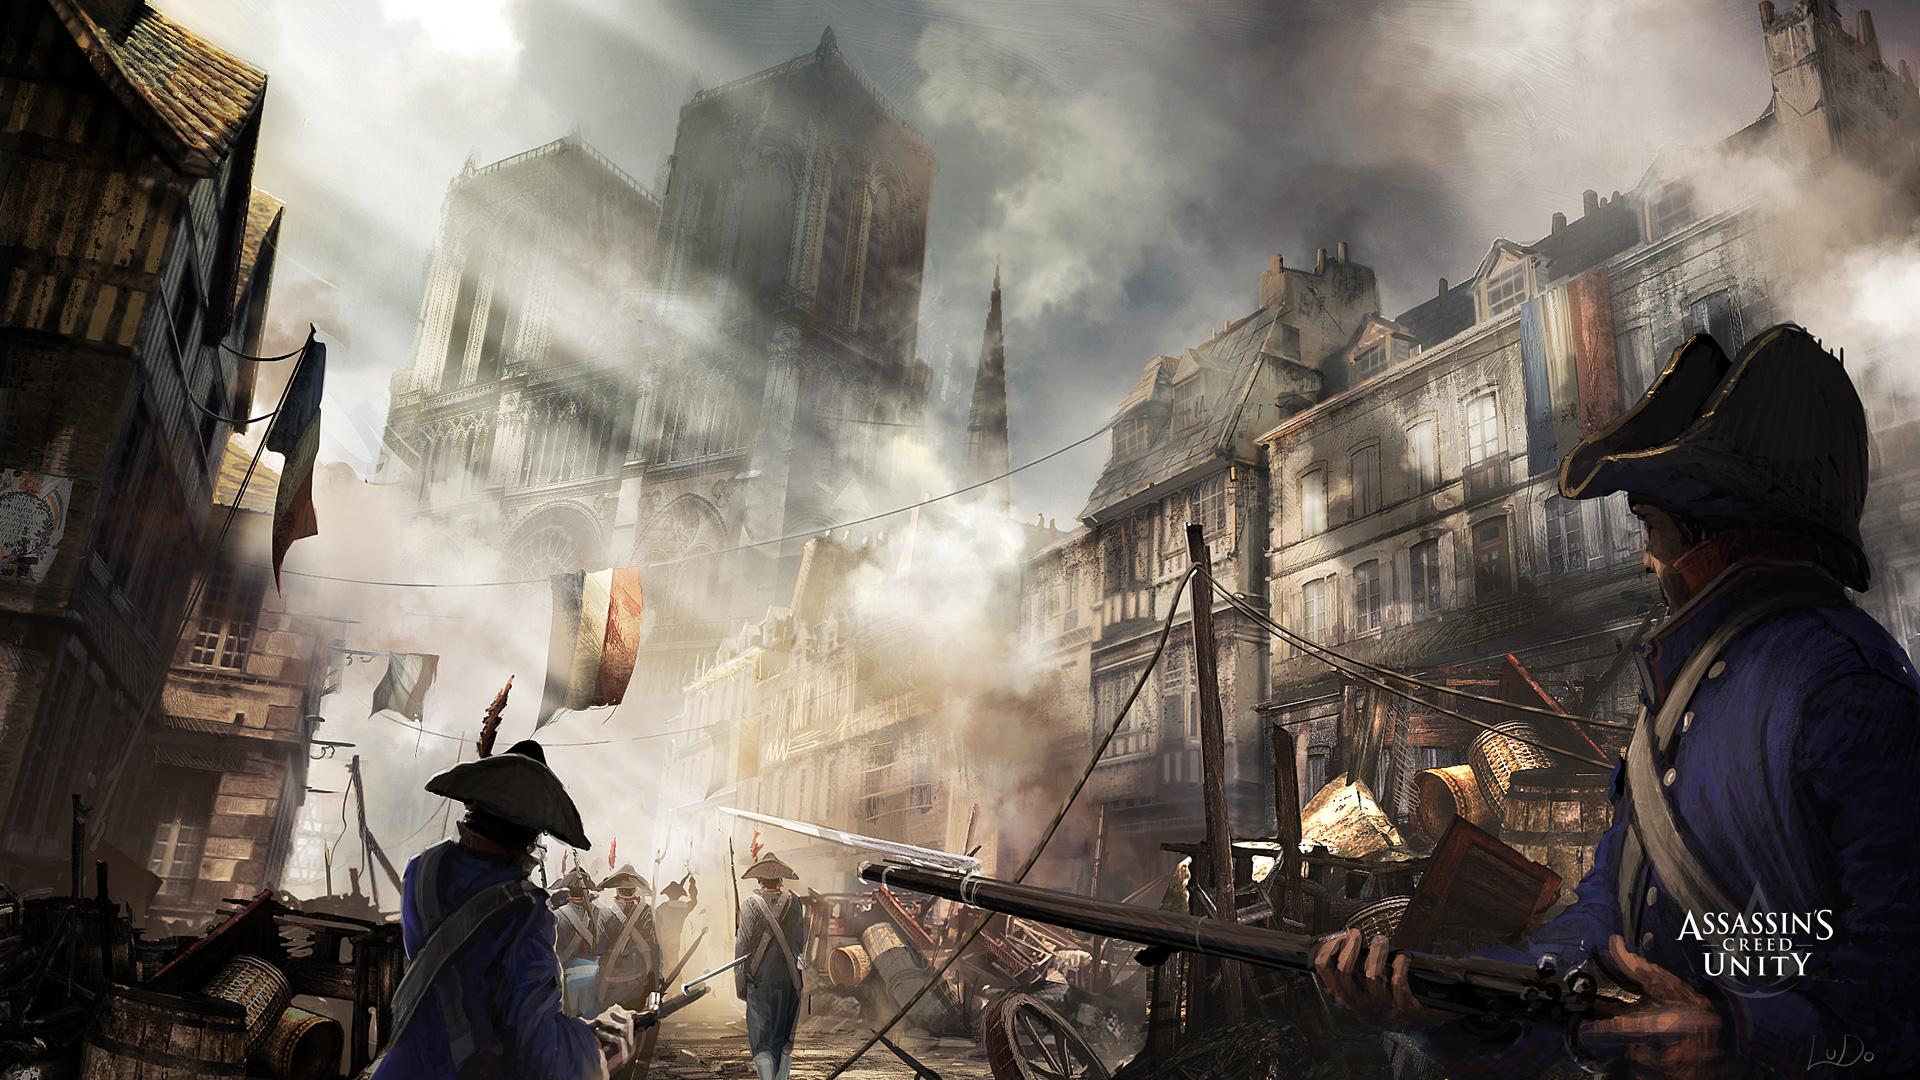 assassins creed unity hd - HD1920×1080